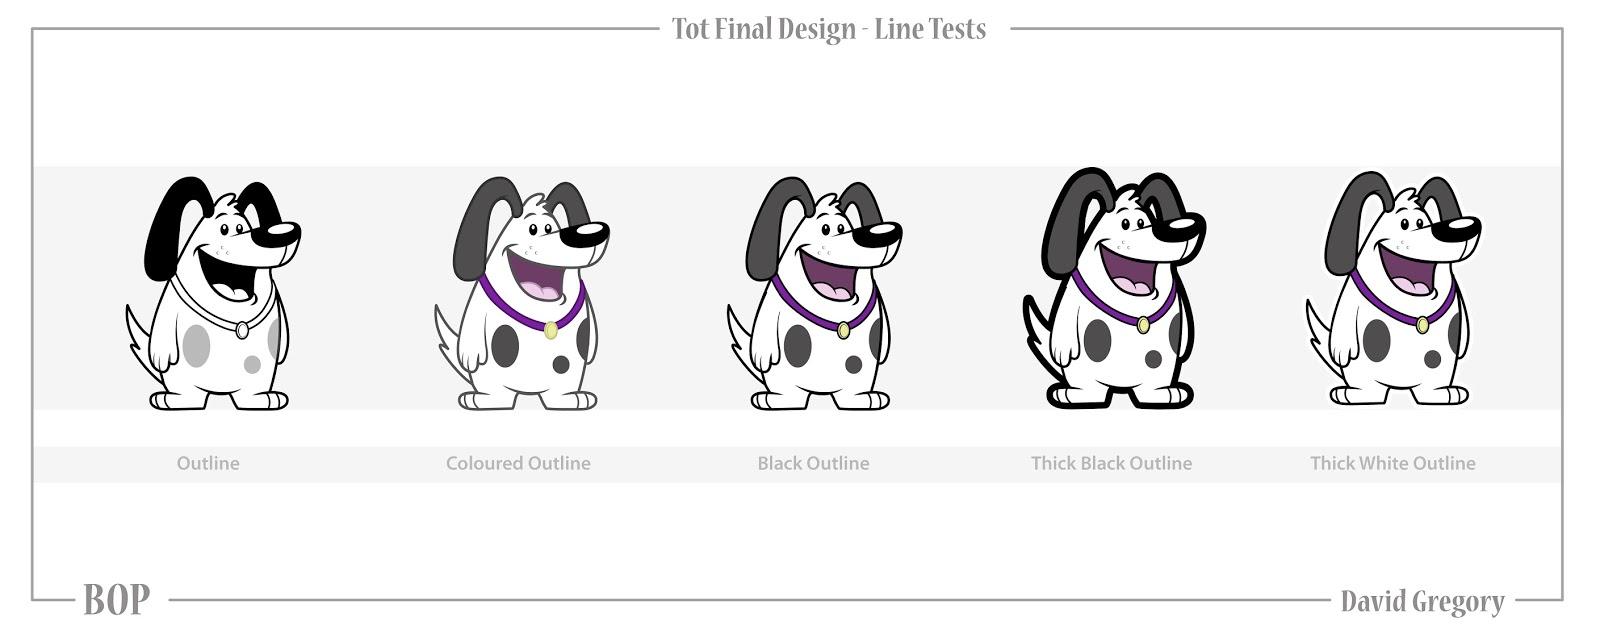 Character Design Freelance Job : David gregory artworks freelance character design work